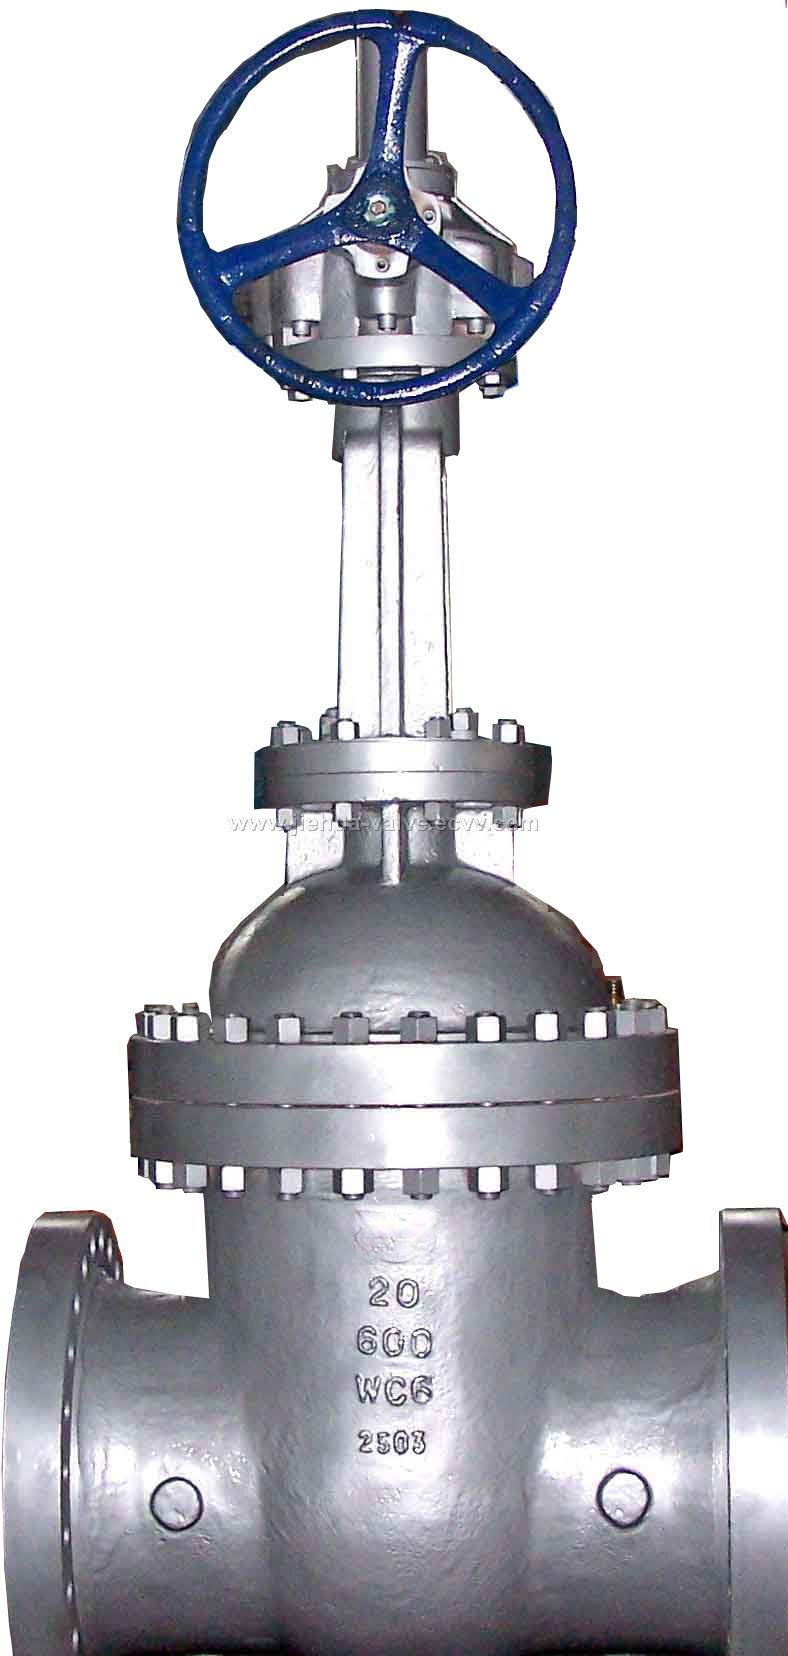 Astm a216 wcb flanged RF RTJ gate valve class 150 300 600